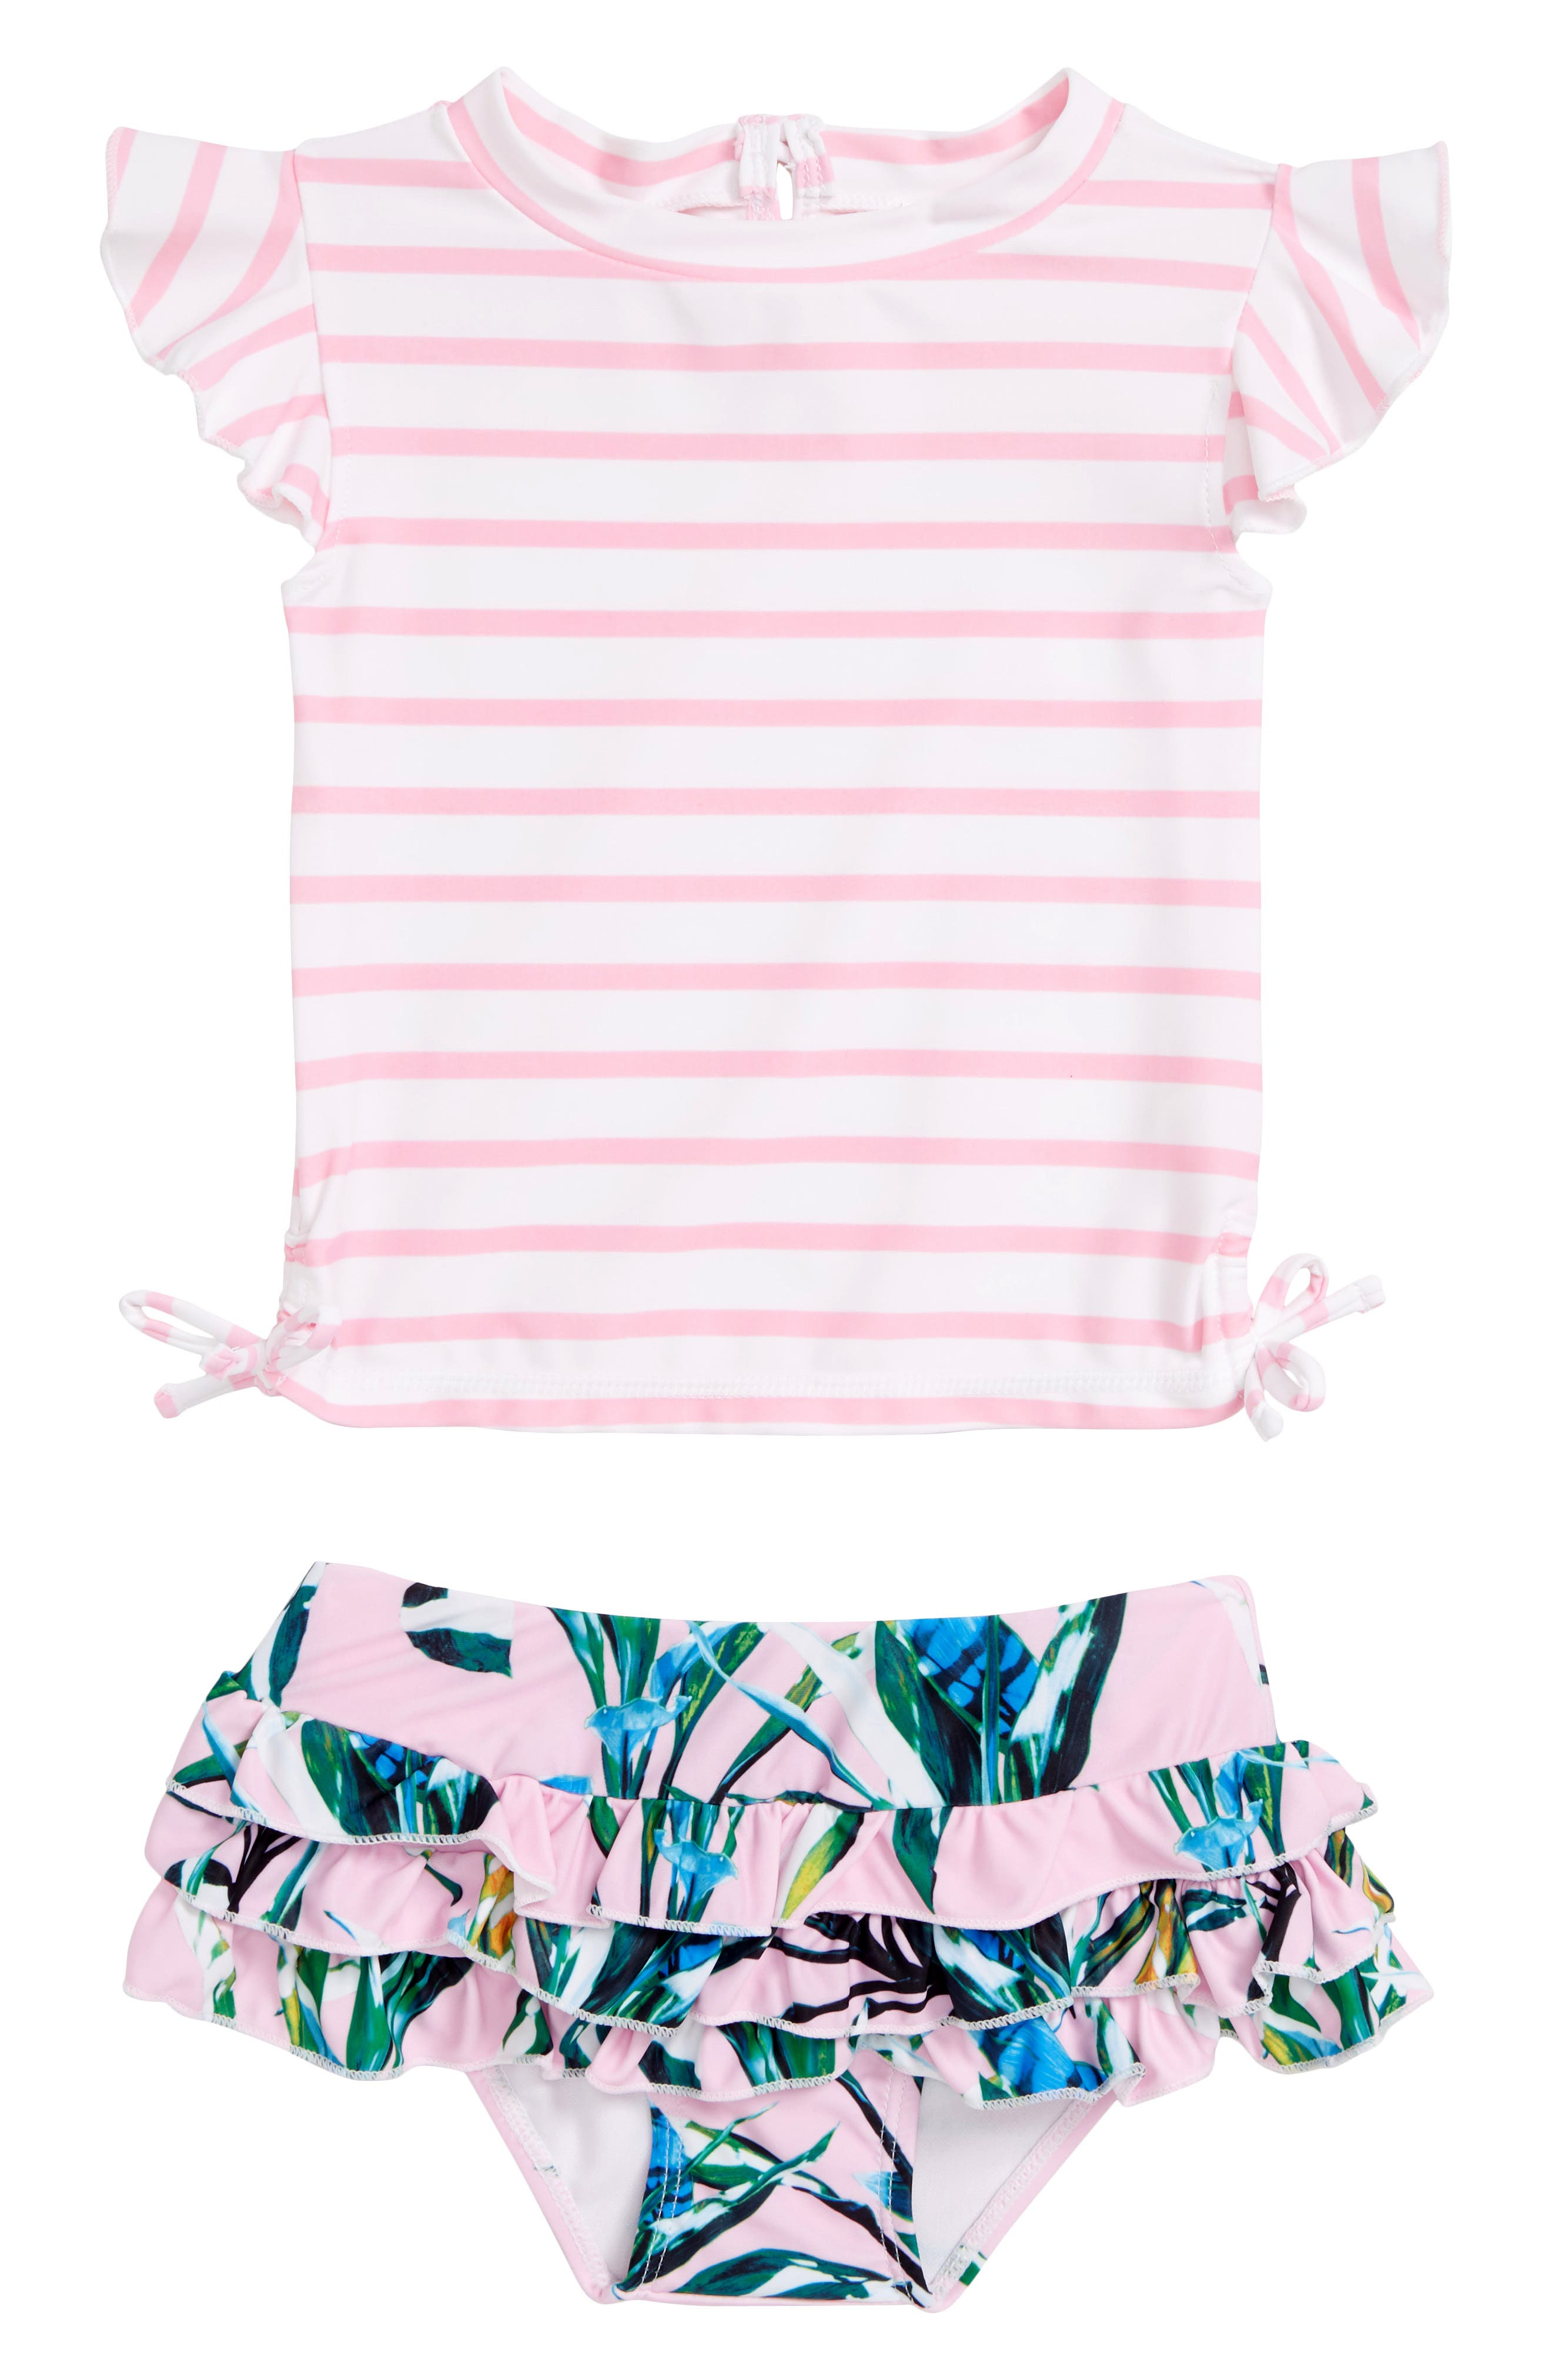 Royale Palm Two-Piece Rashguard Swimsuit, Main, color, PINK